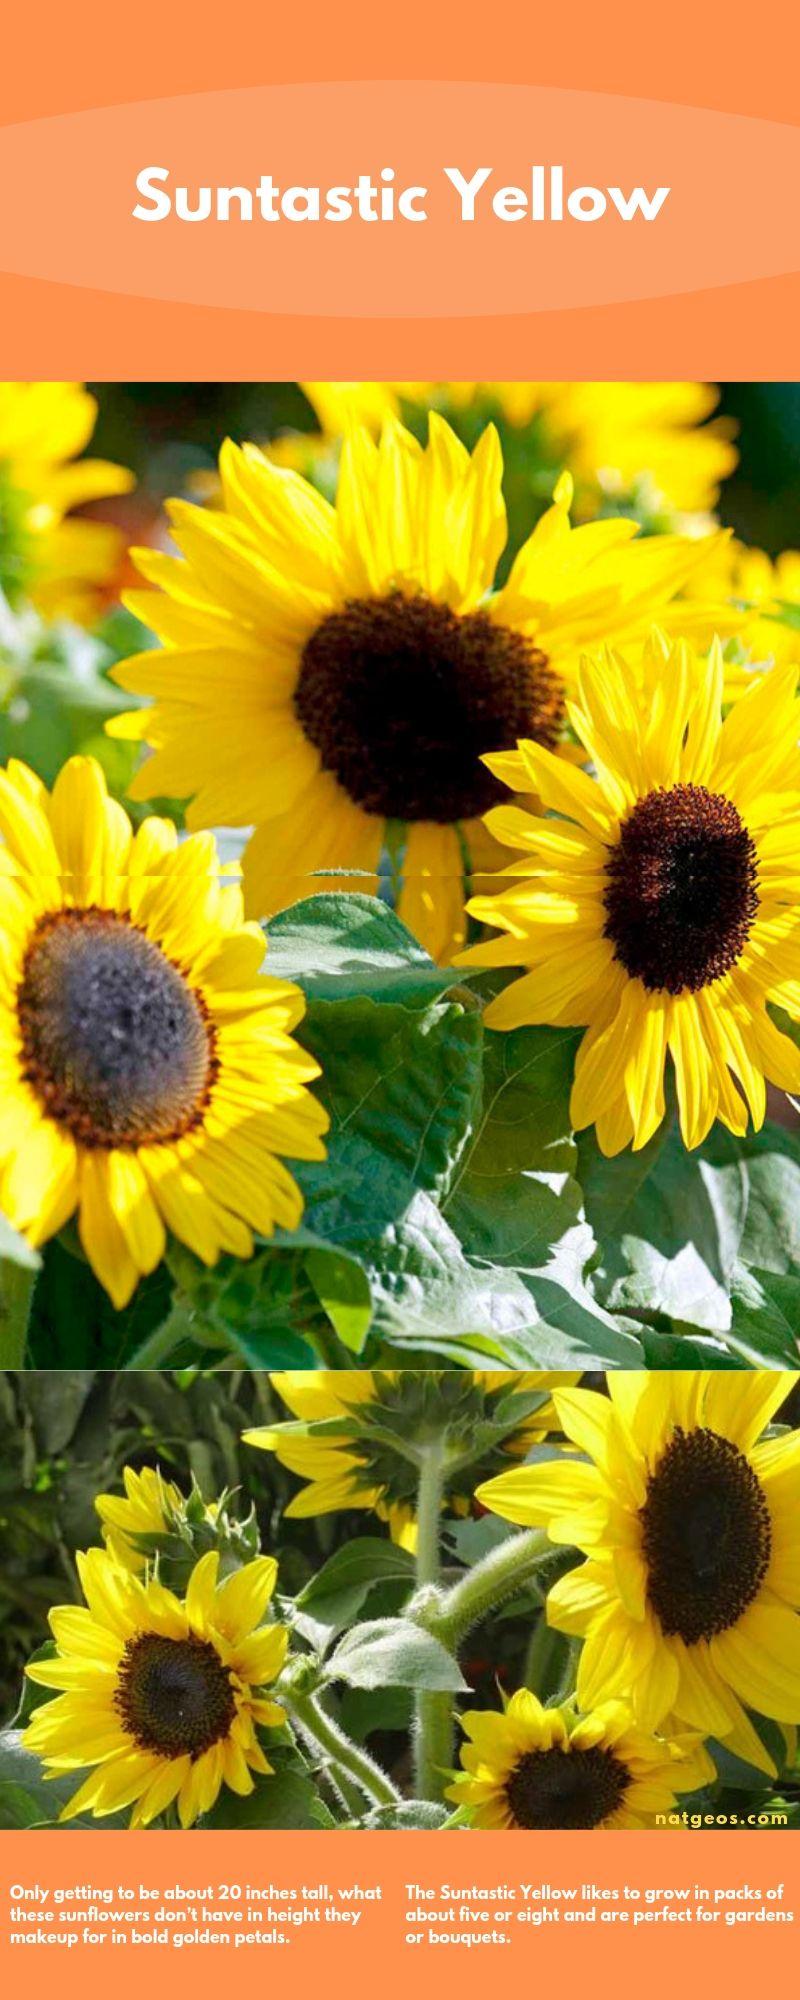 Suntastic Yellow